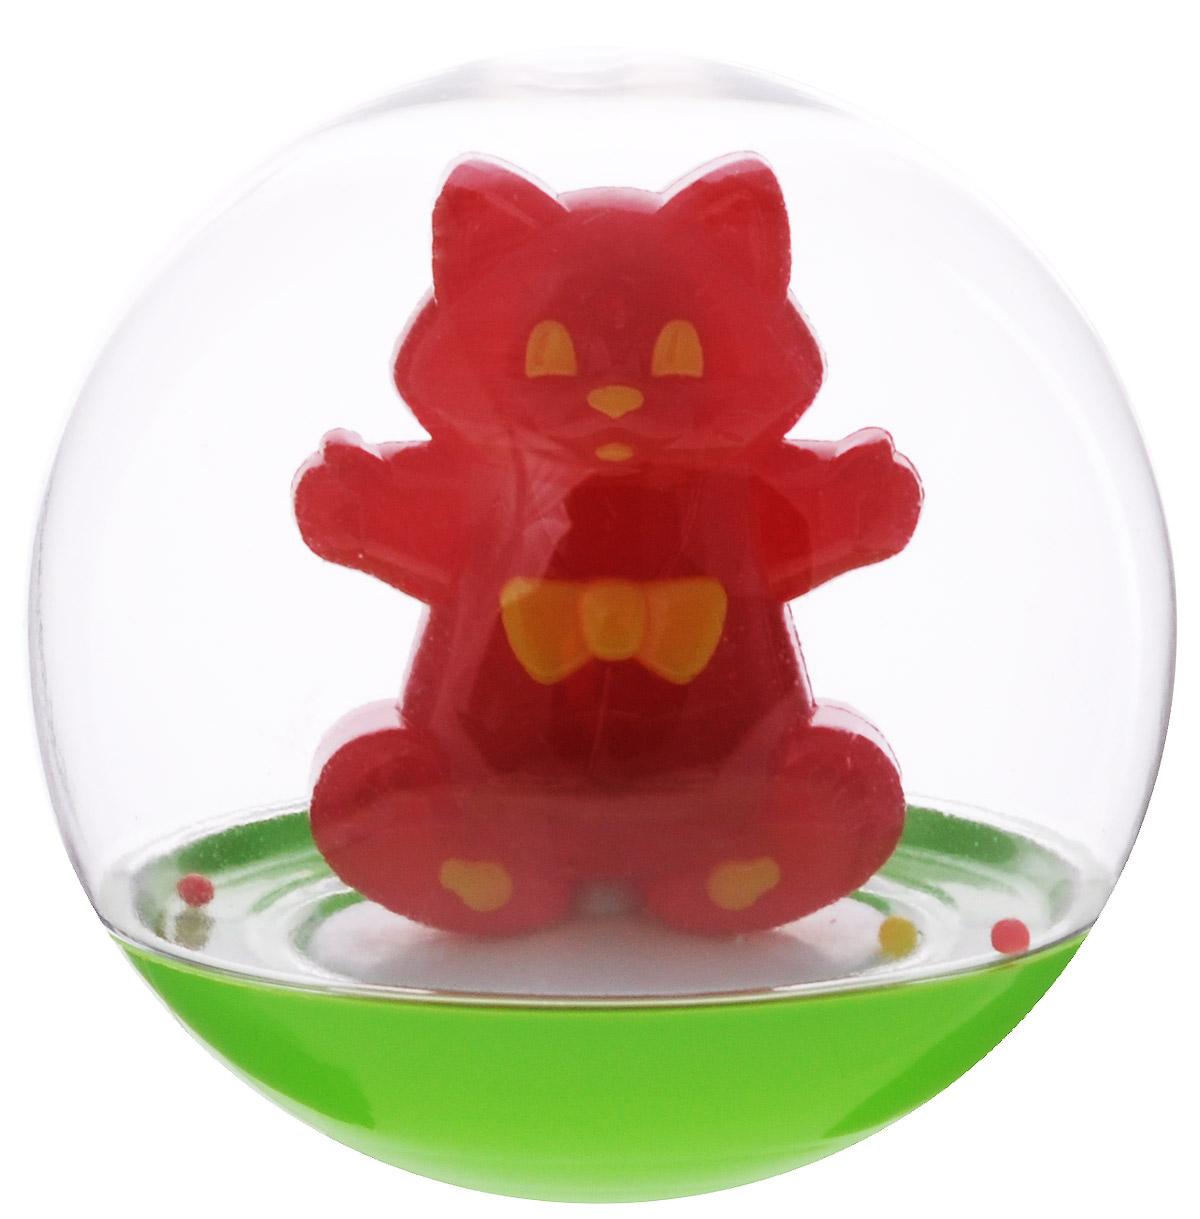 Stellar Погремушка-неваляшка Кот цвет красный stellar погремушка клоун красный